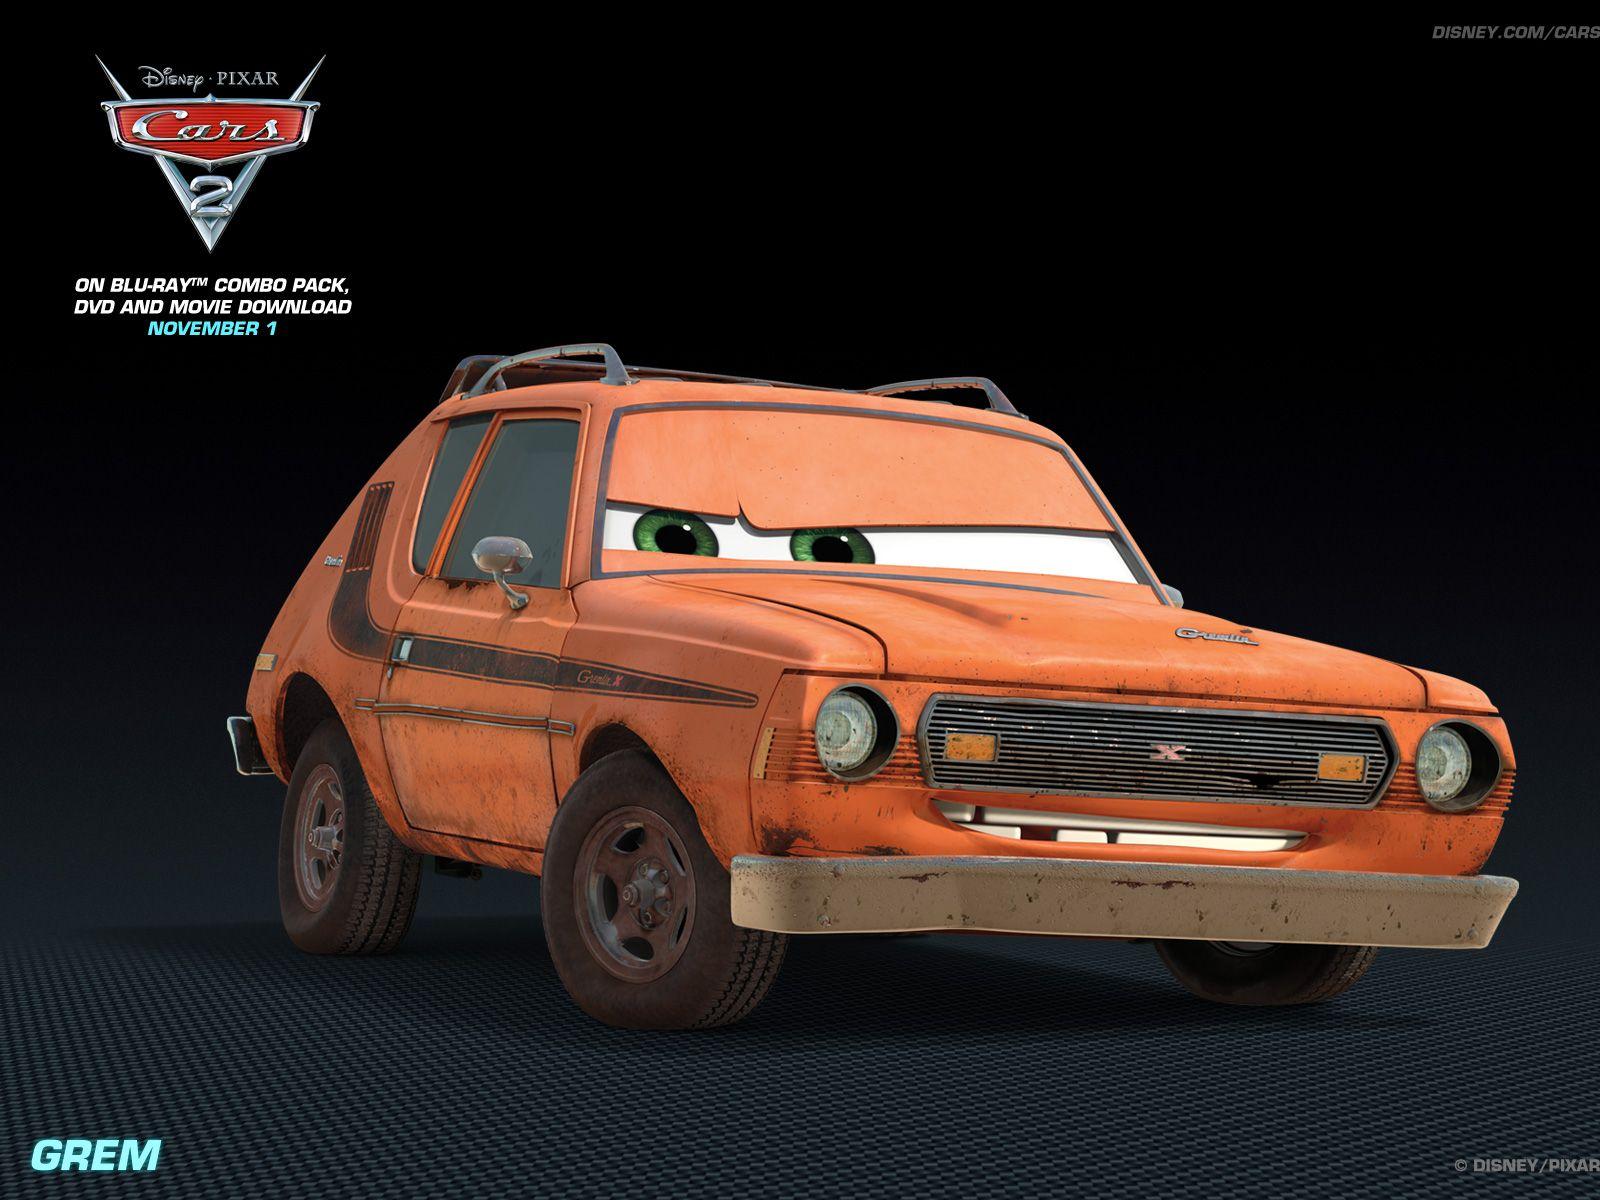 Cars Movie Characters: Grem - Disney Pixar Cars 2 Wallpaper